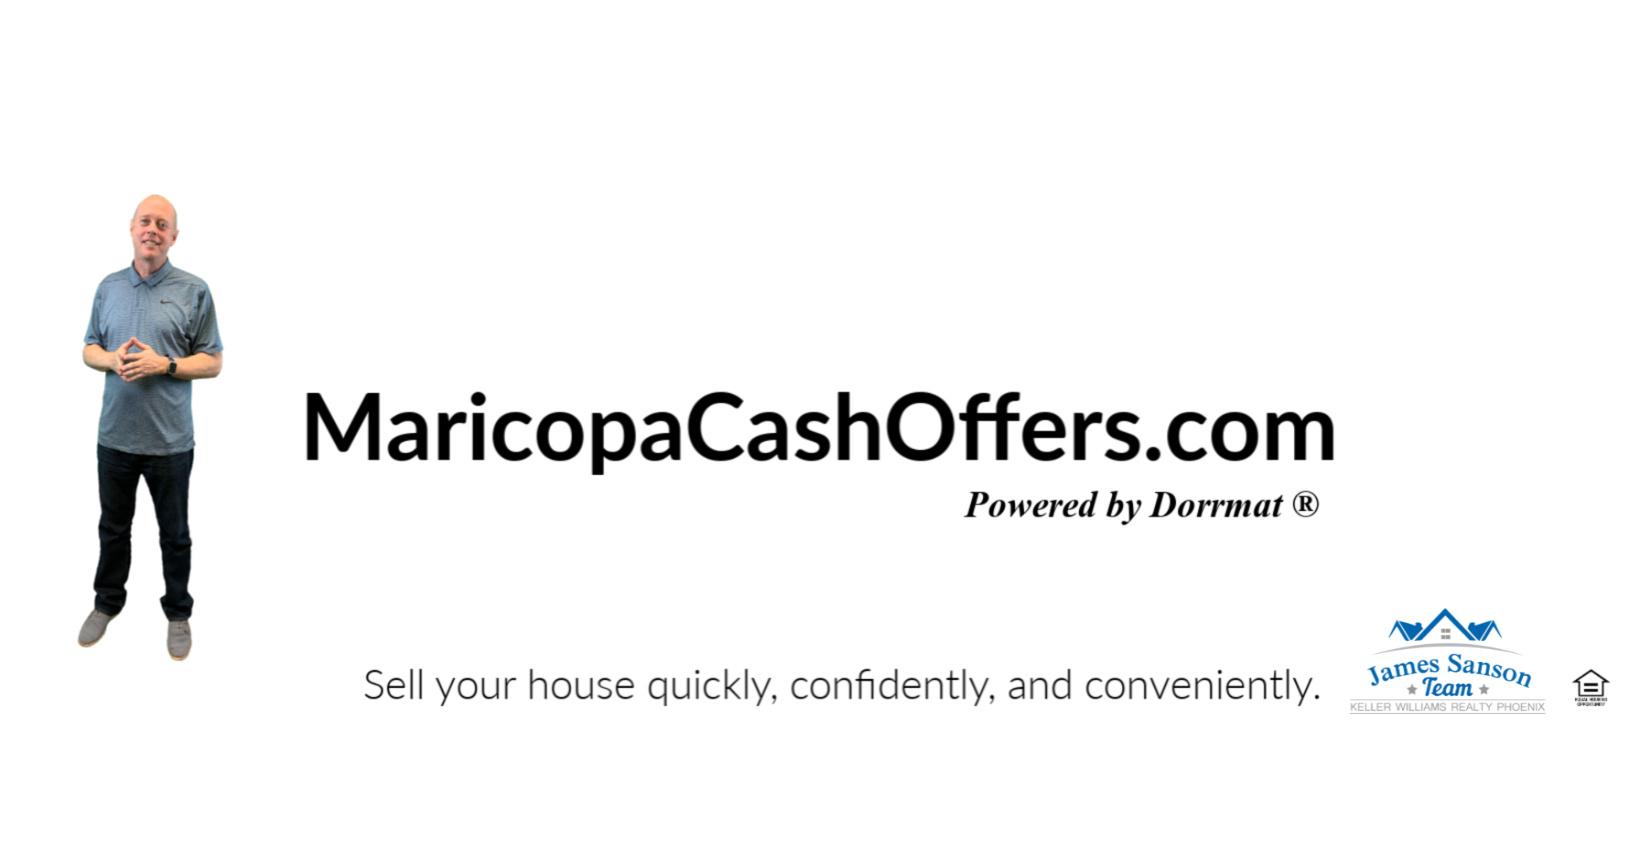 Maricopa Cash Offers